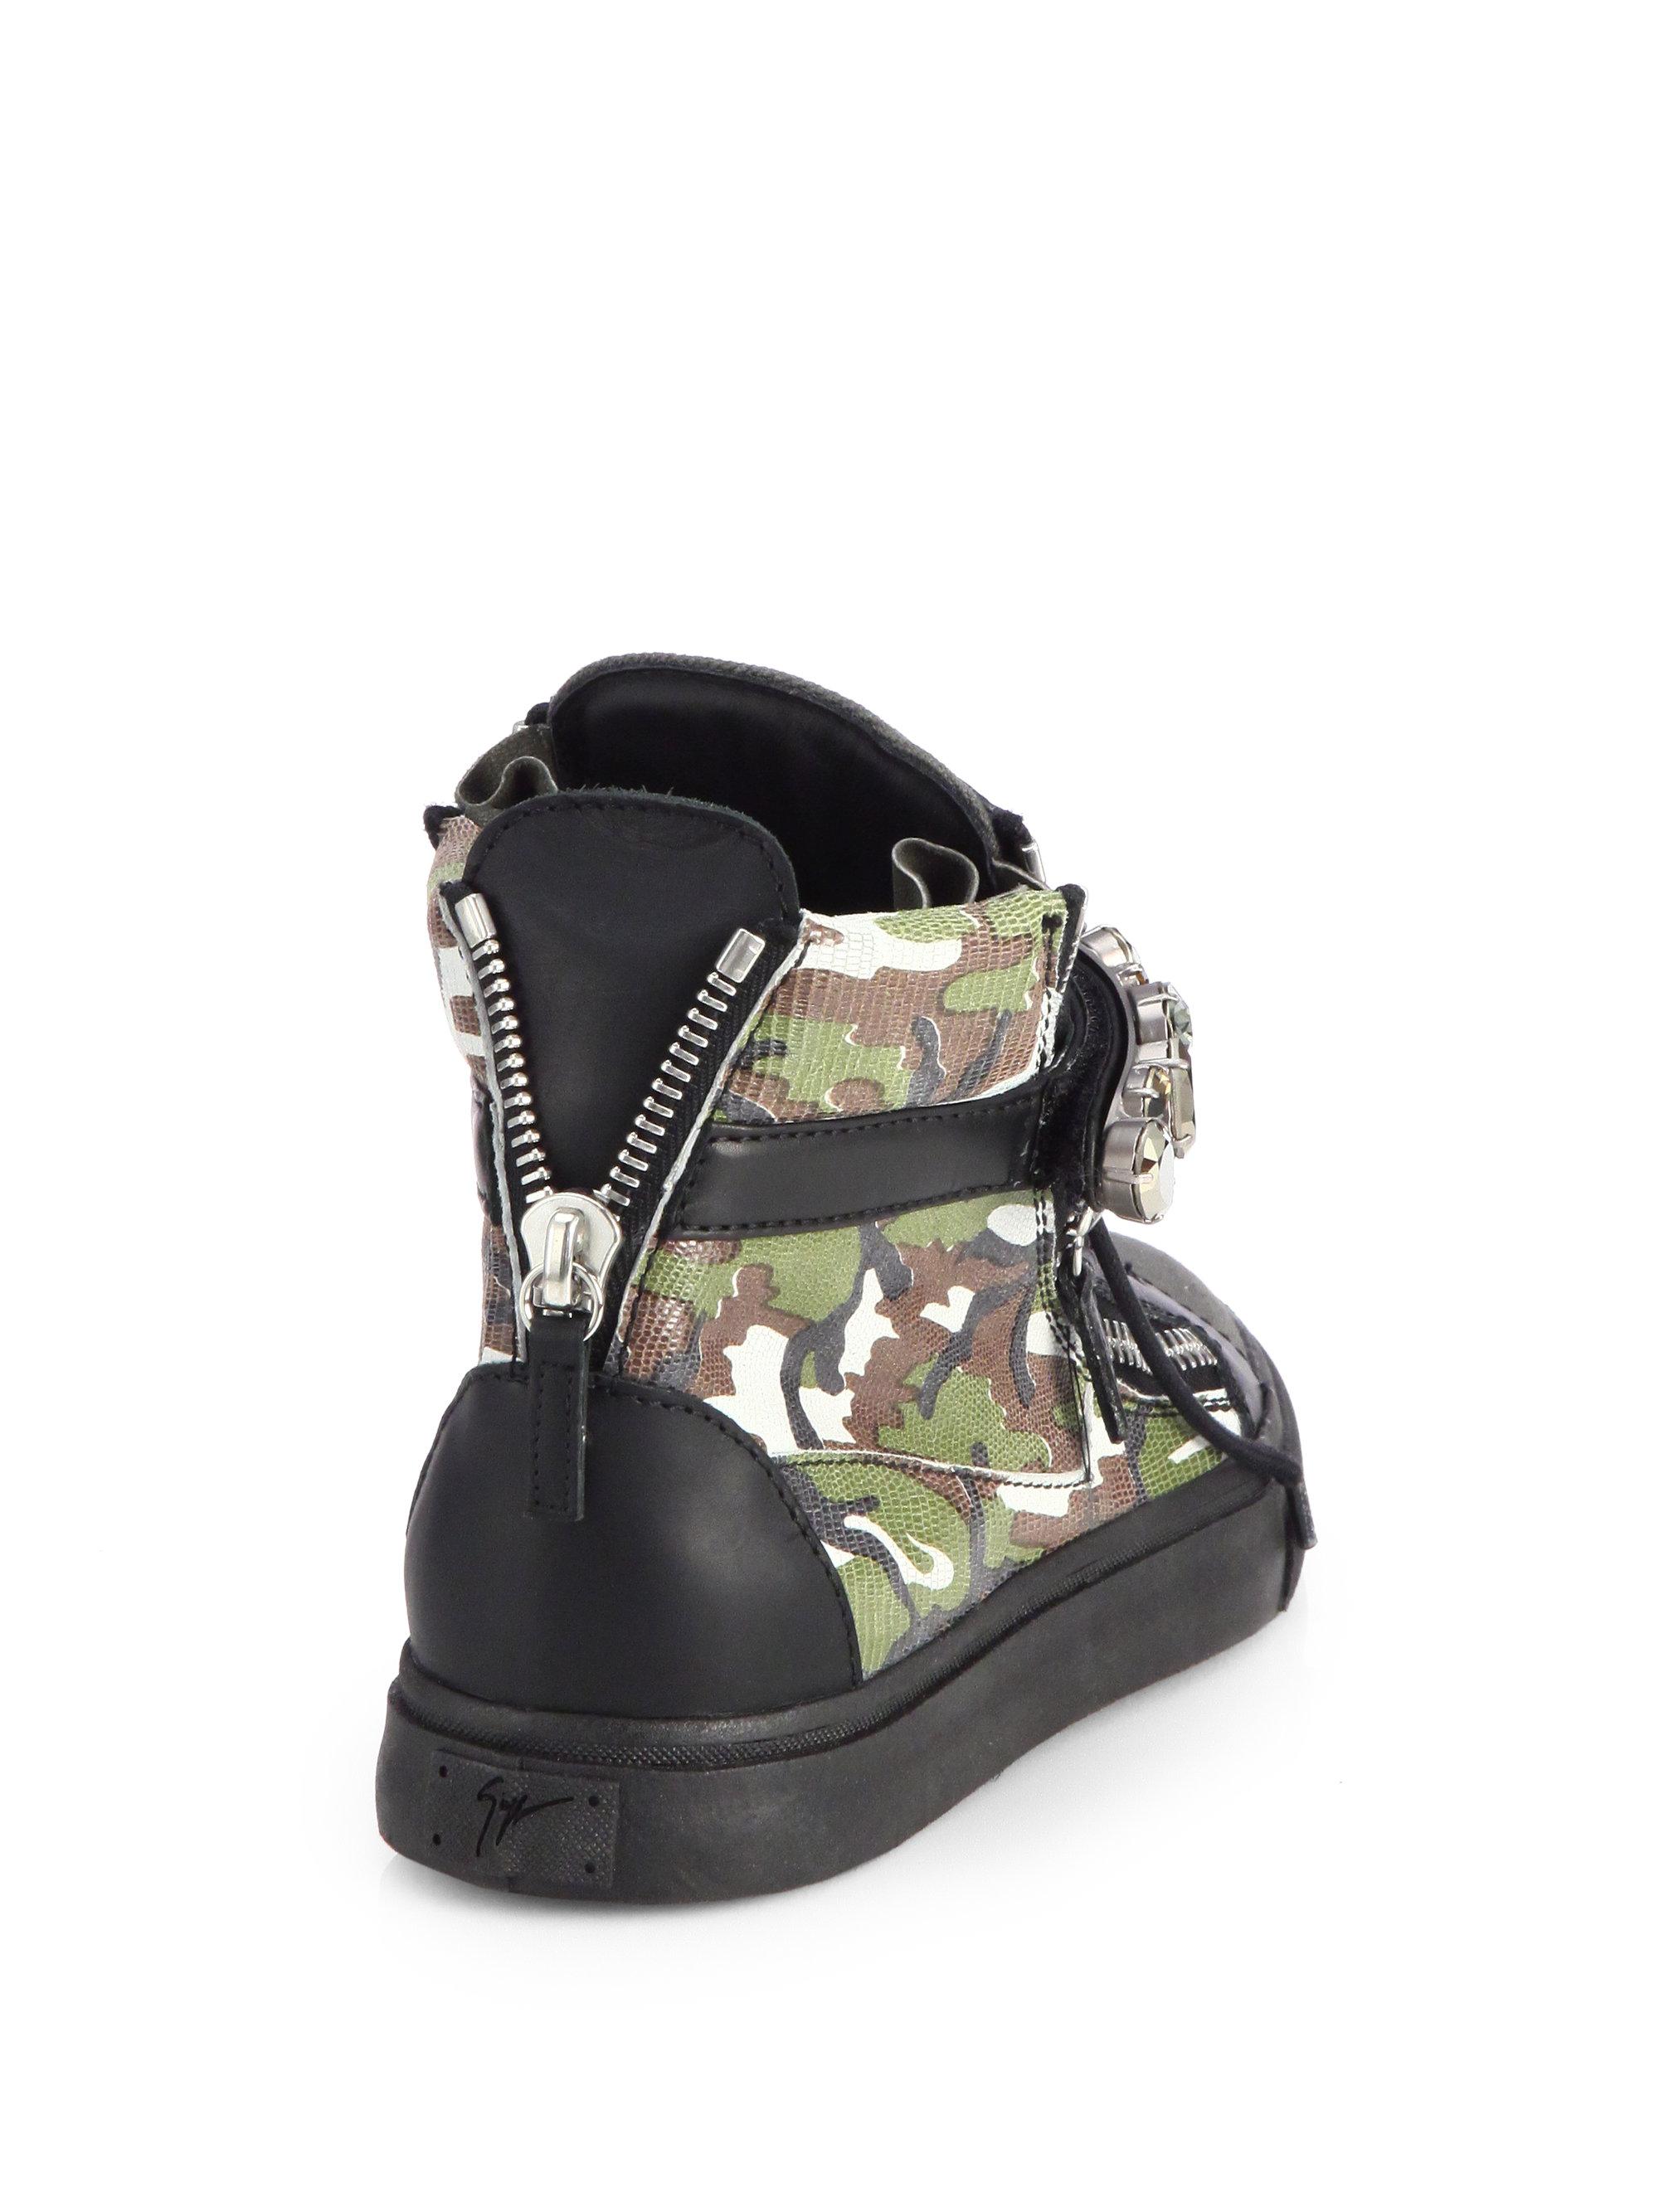 Giuseppe zanotti Jeweled Camouflage Leather Wedge Sneakers ...